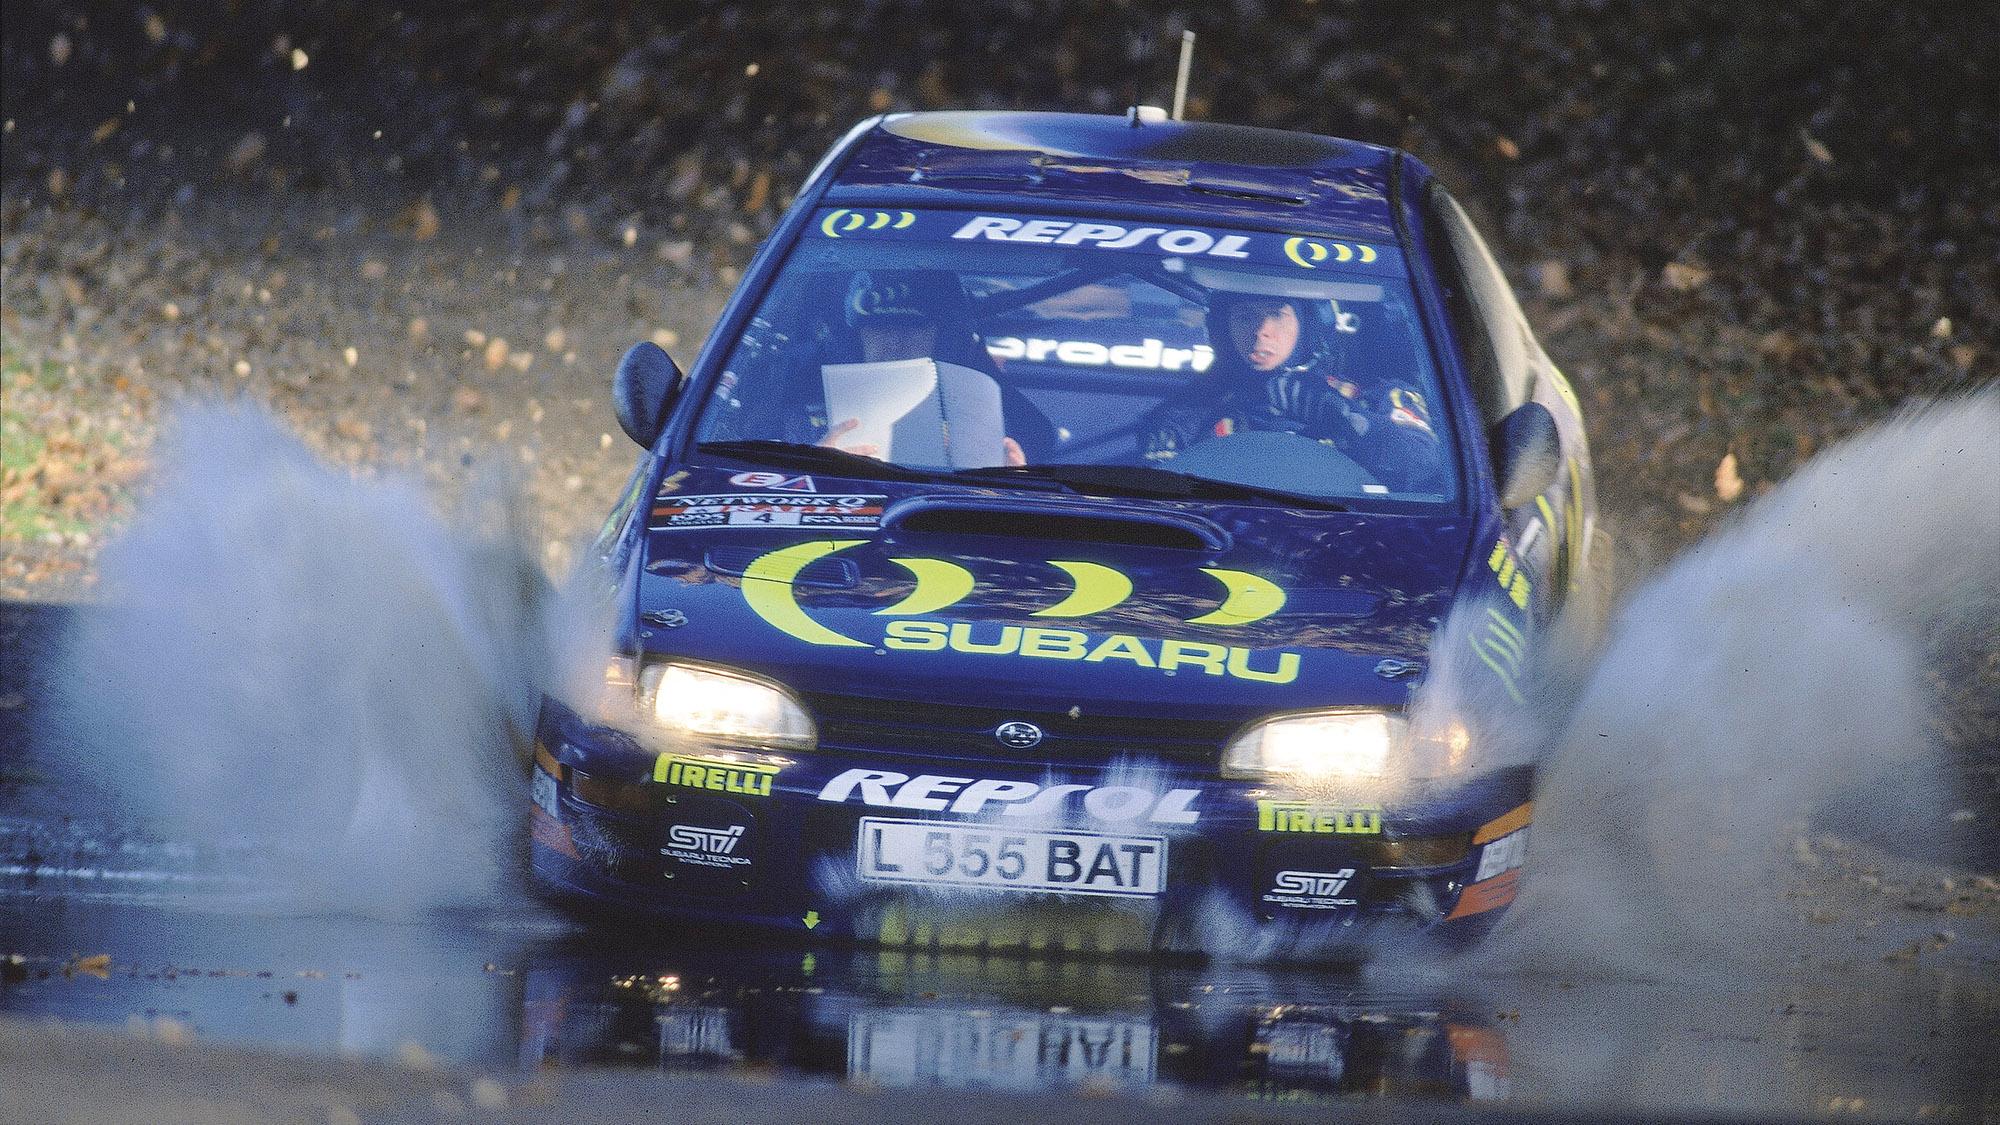 Subaru of Colin McRae splashes through water on the 1995 RAC Rally